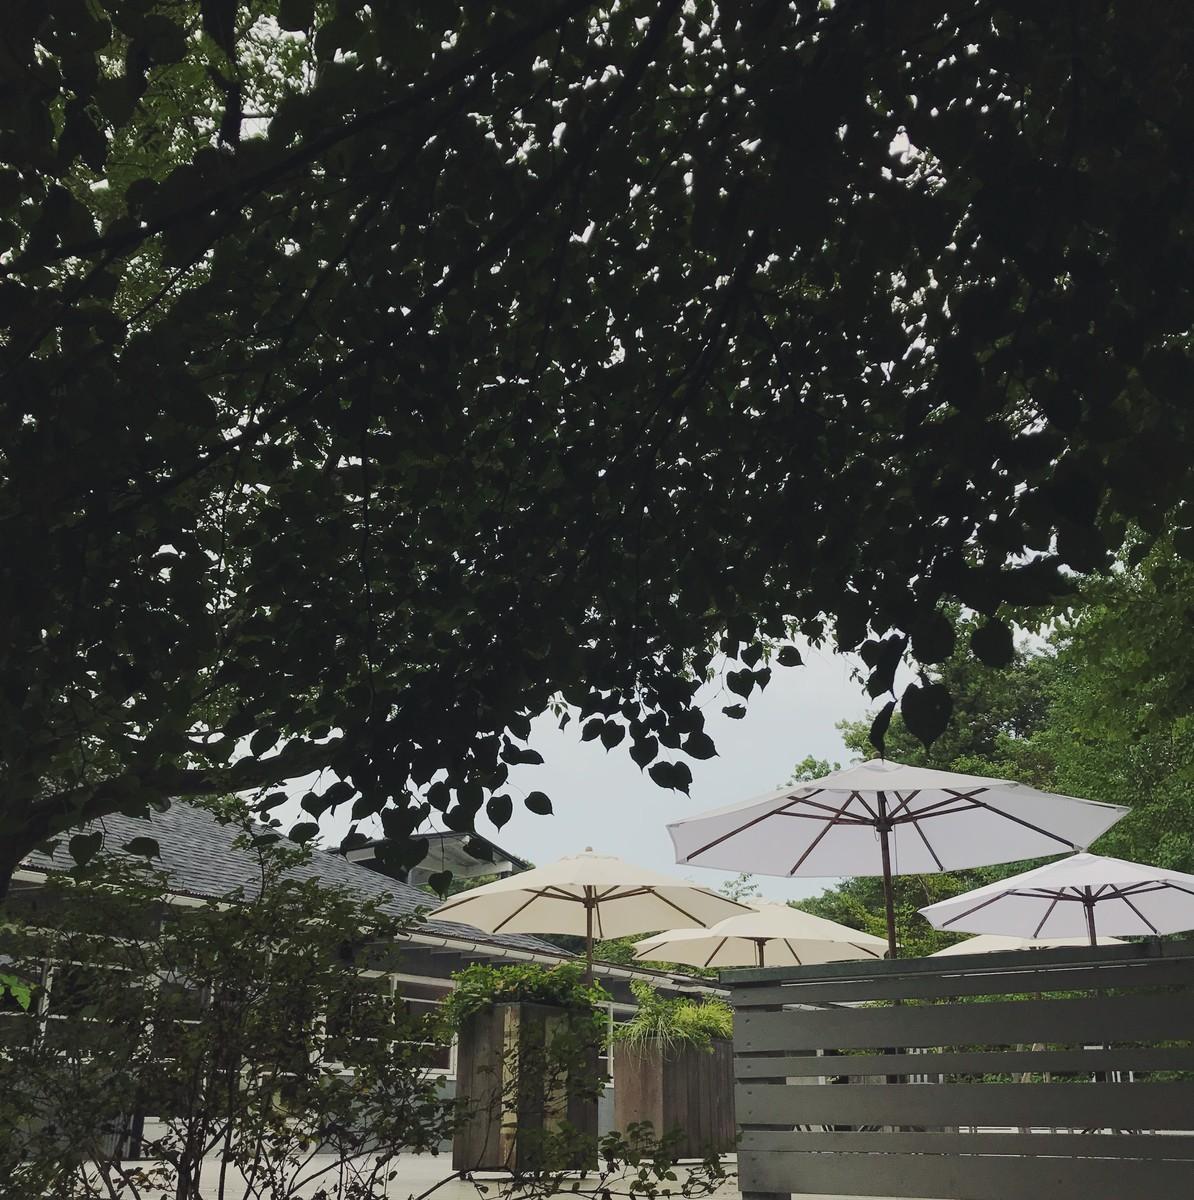 f:id:asacafe:20190820233609j:plain